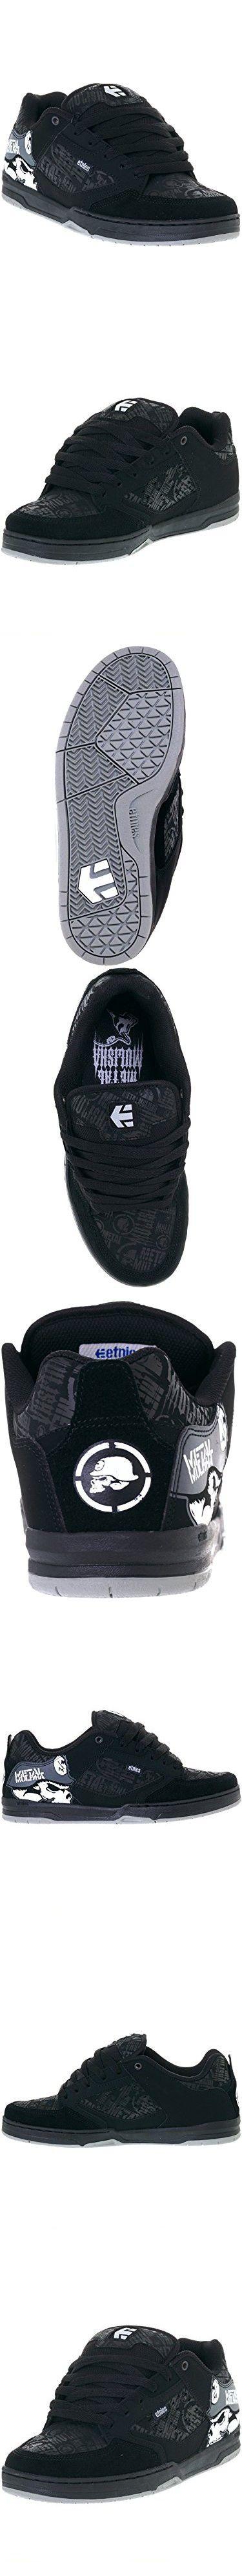 Etnies Men's Metal Mulisha Cartel Skateboarding Shoe, Black/Skulls, 10 M US